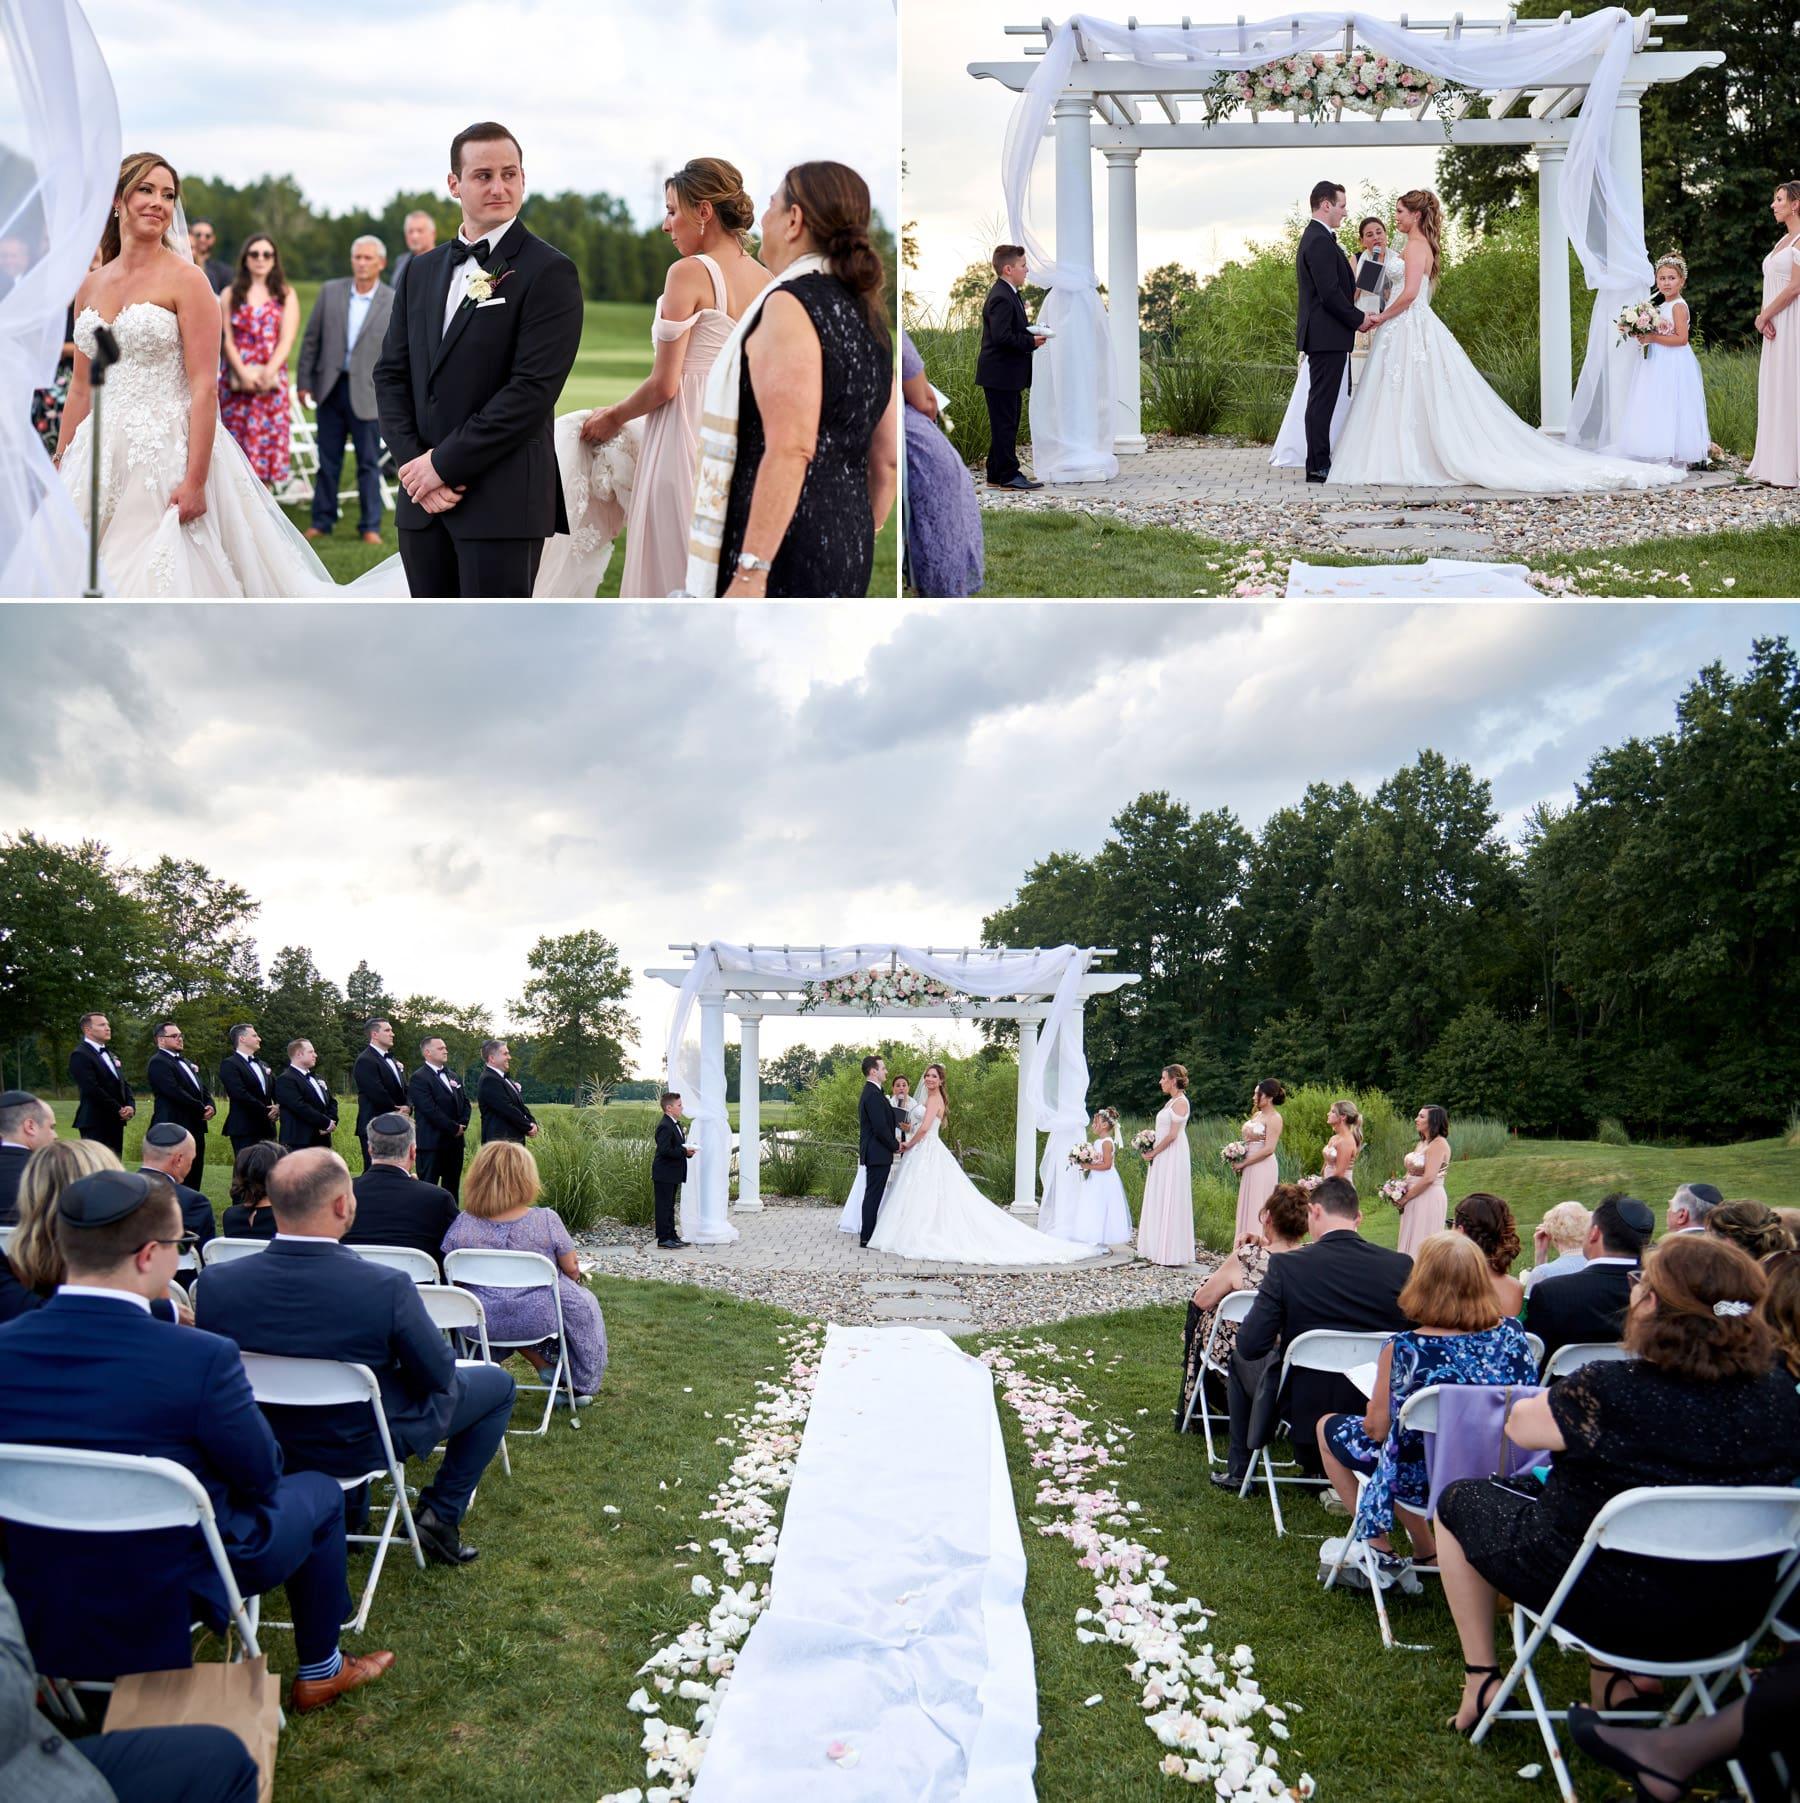 outdoor wedding ceremony photos at Royce Brook Golf Club